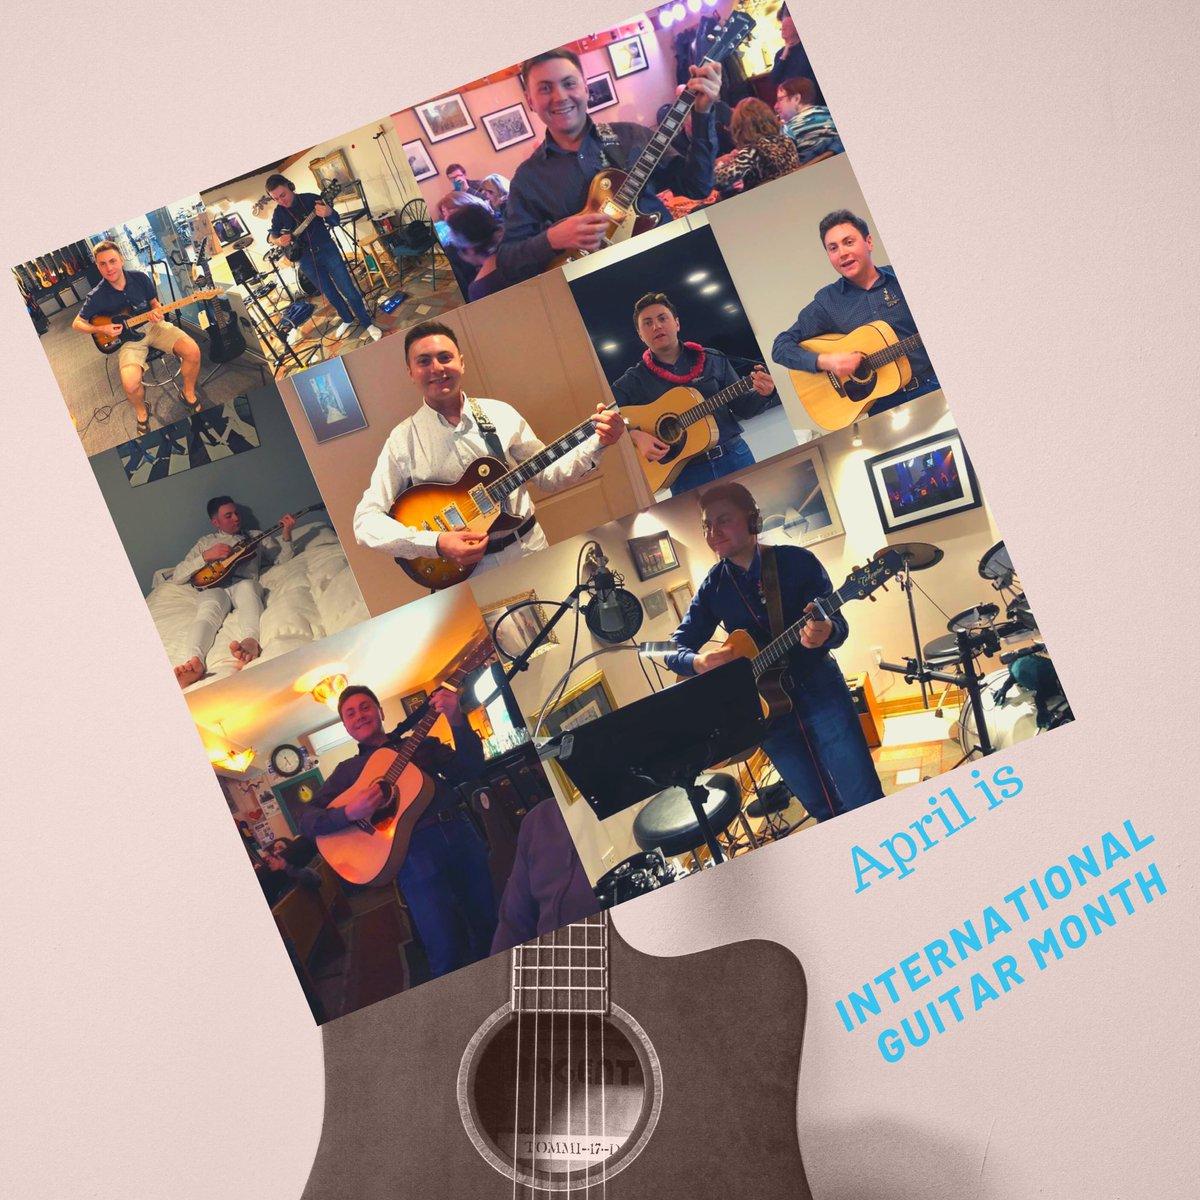 April is International guitar month ! . . . #InternationalGuitarMonth  #RecordingSession  #Guitar #Guitarist #SingerSongwriter #Music #Musician #OpenMic #MusicStore  #Fender #NormanGuitar #MariposaCafé #LesPaul #JonahSchwartzsMusicpic.twitter.com/YUDSAwLDxu